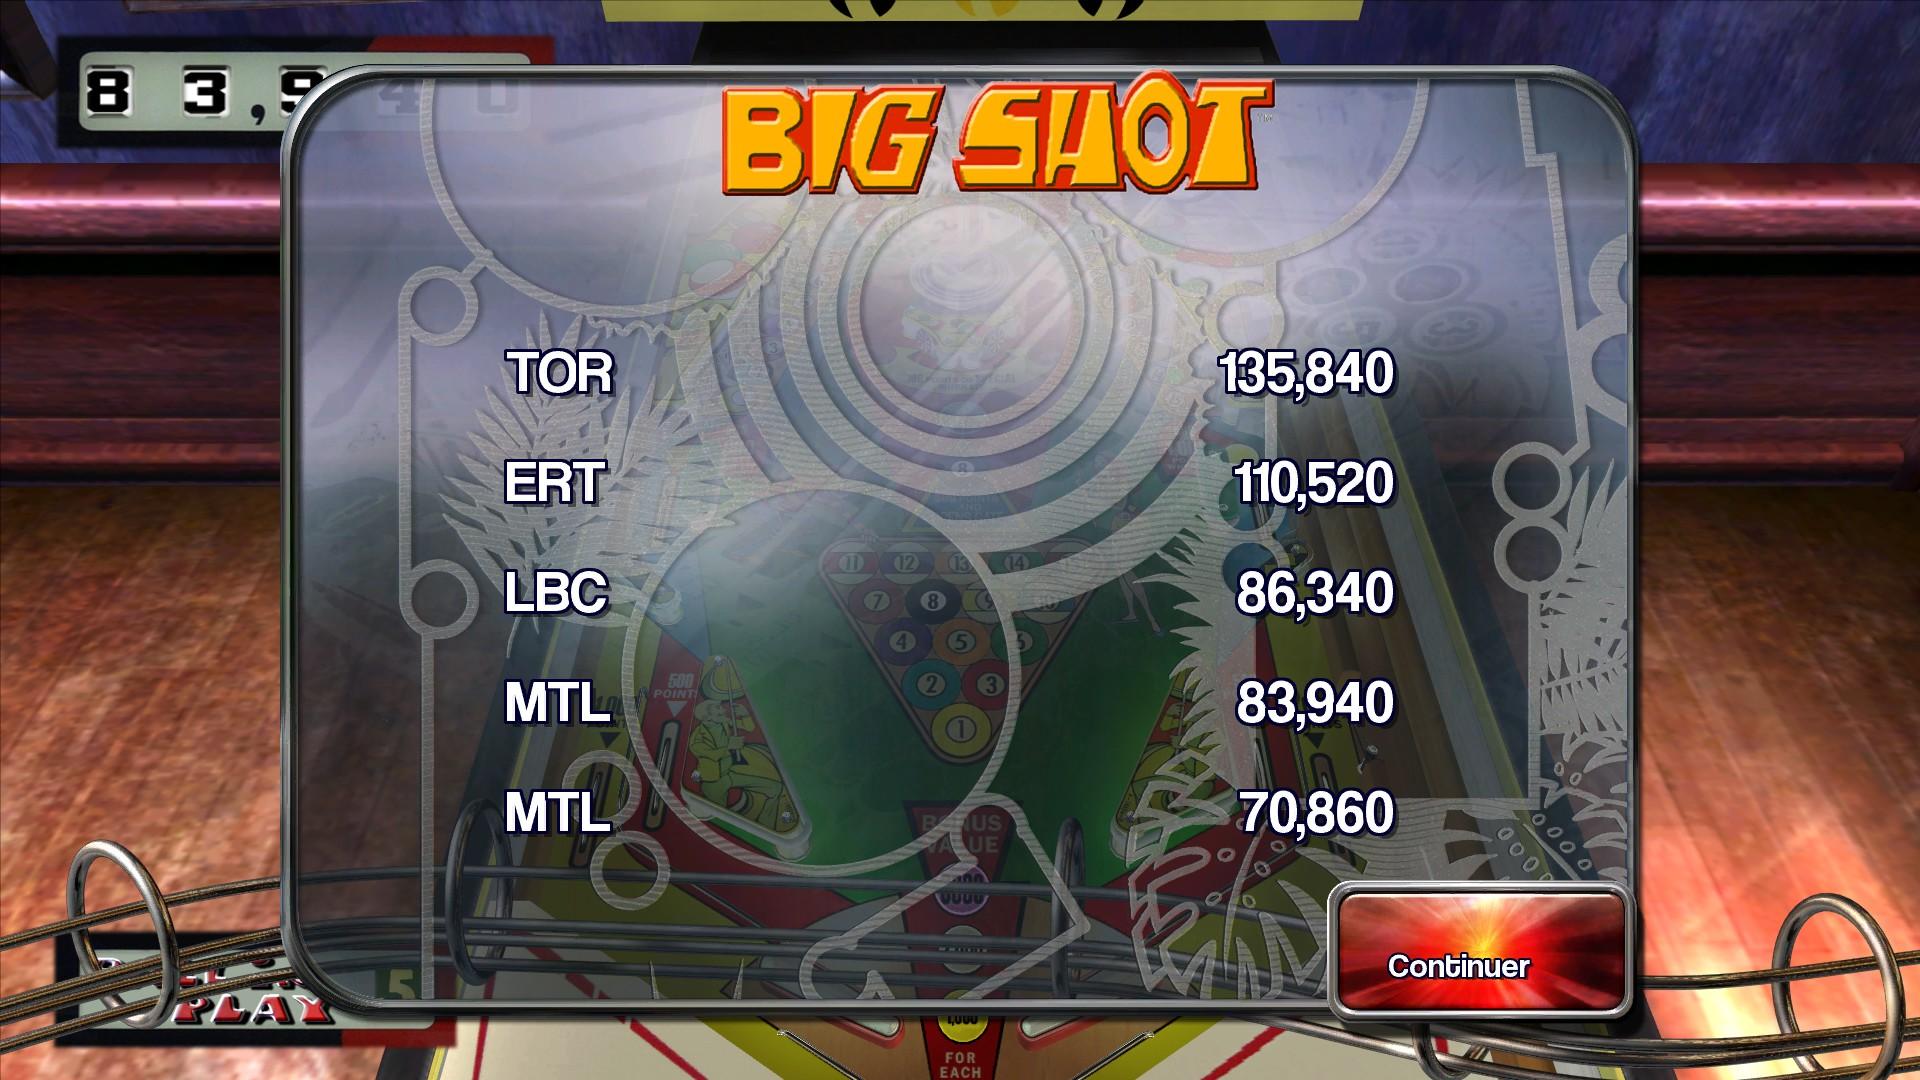 Mantalow: Pinball Arcade: Big Shot (PC) 83,940 points on 2015-04-04 05:05:18